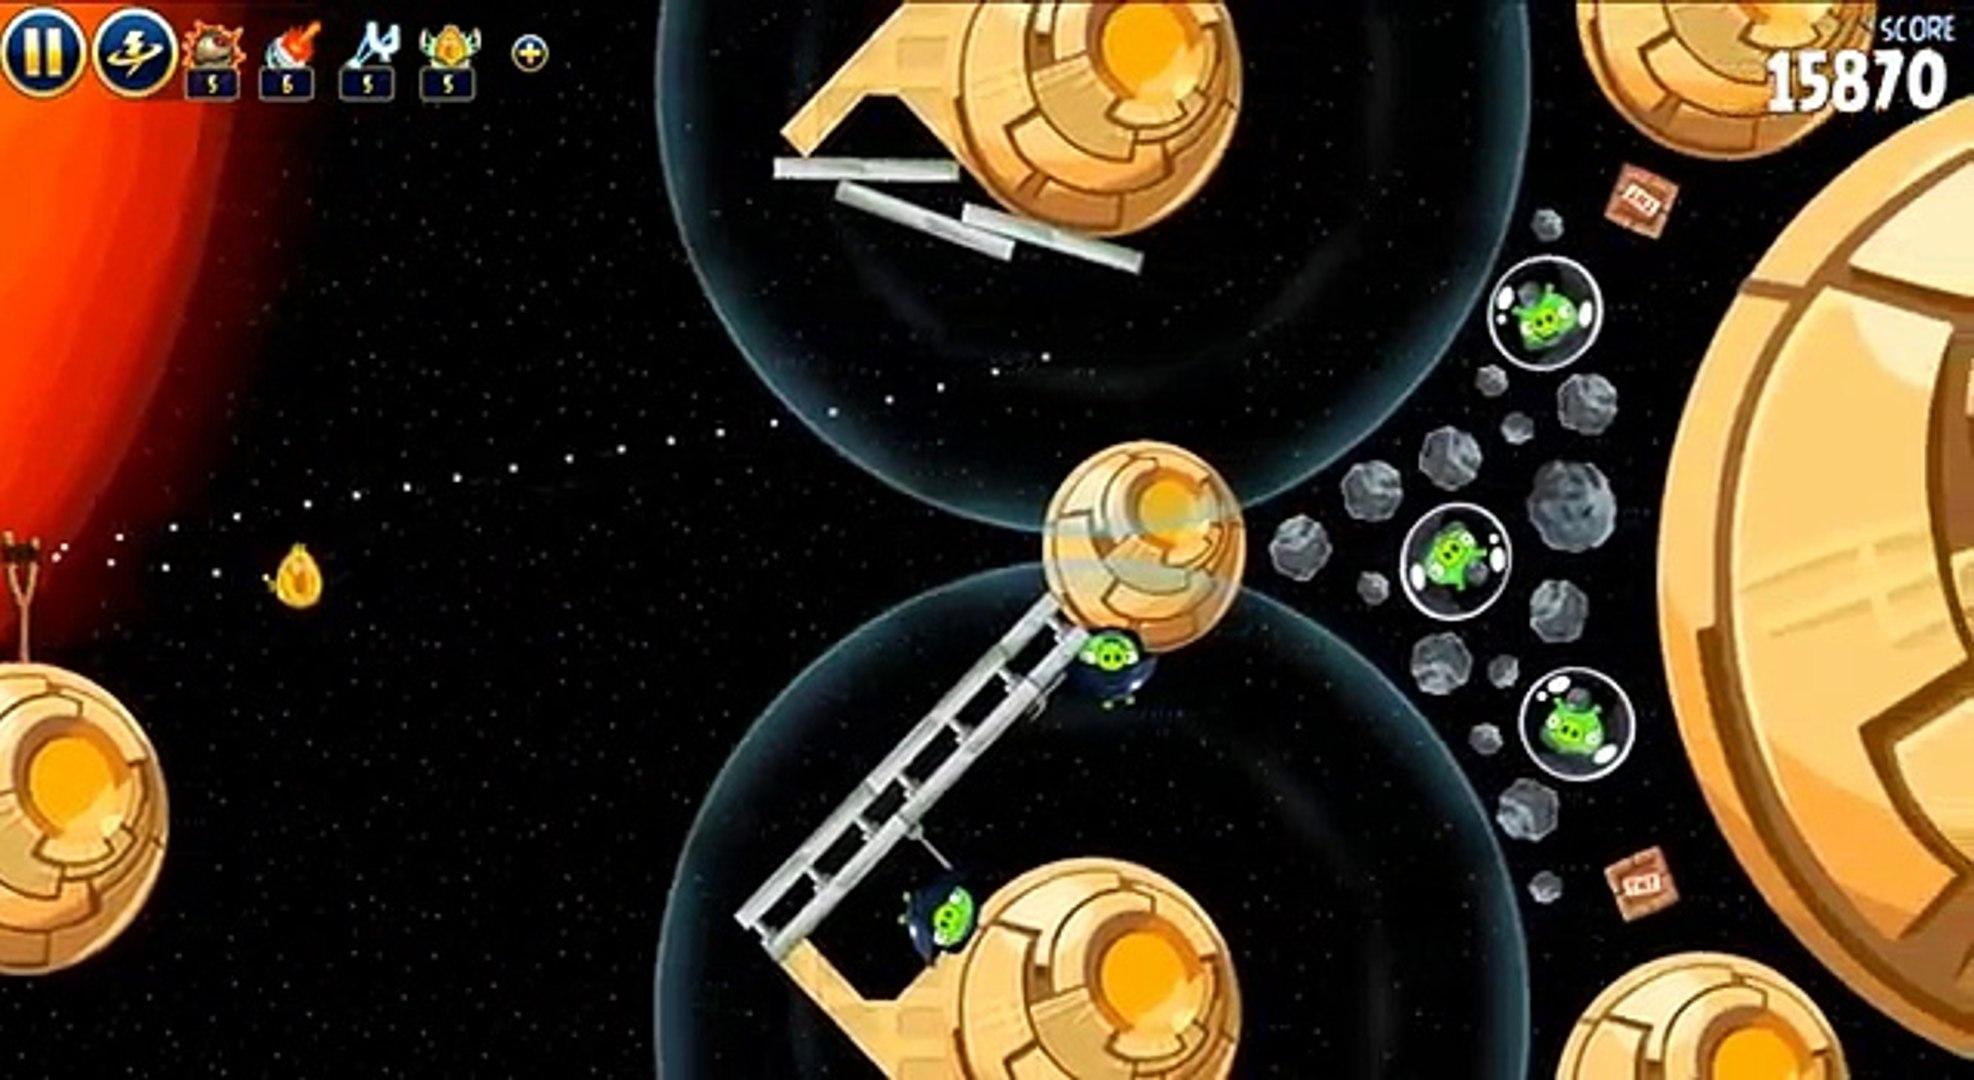 Best Mobile Kids Games - Angry Birds Star Wars - Rovio Entertainment Ltd